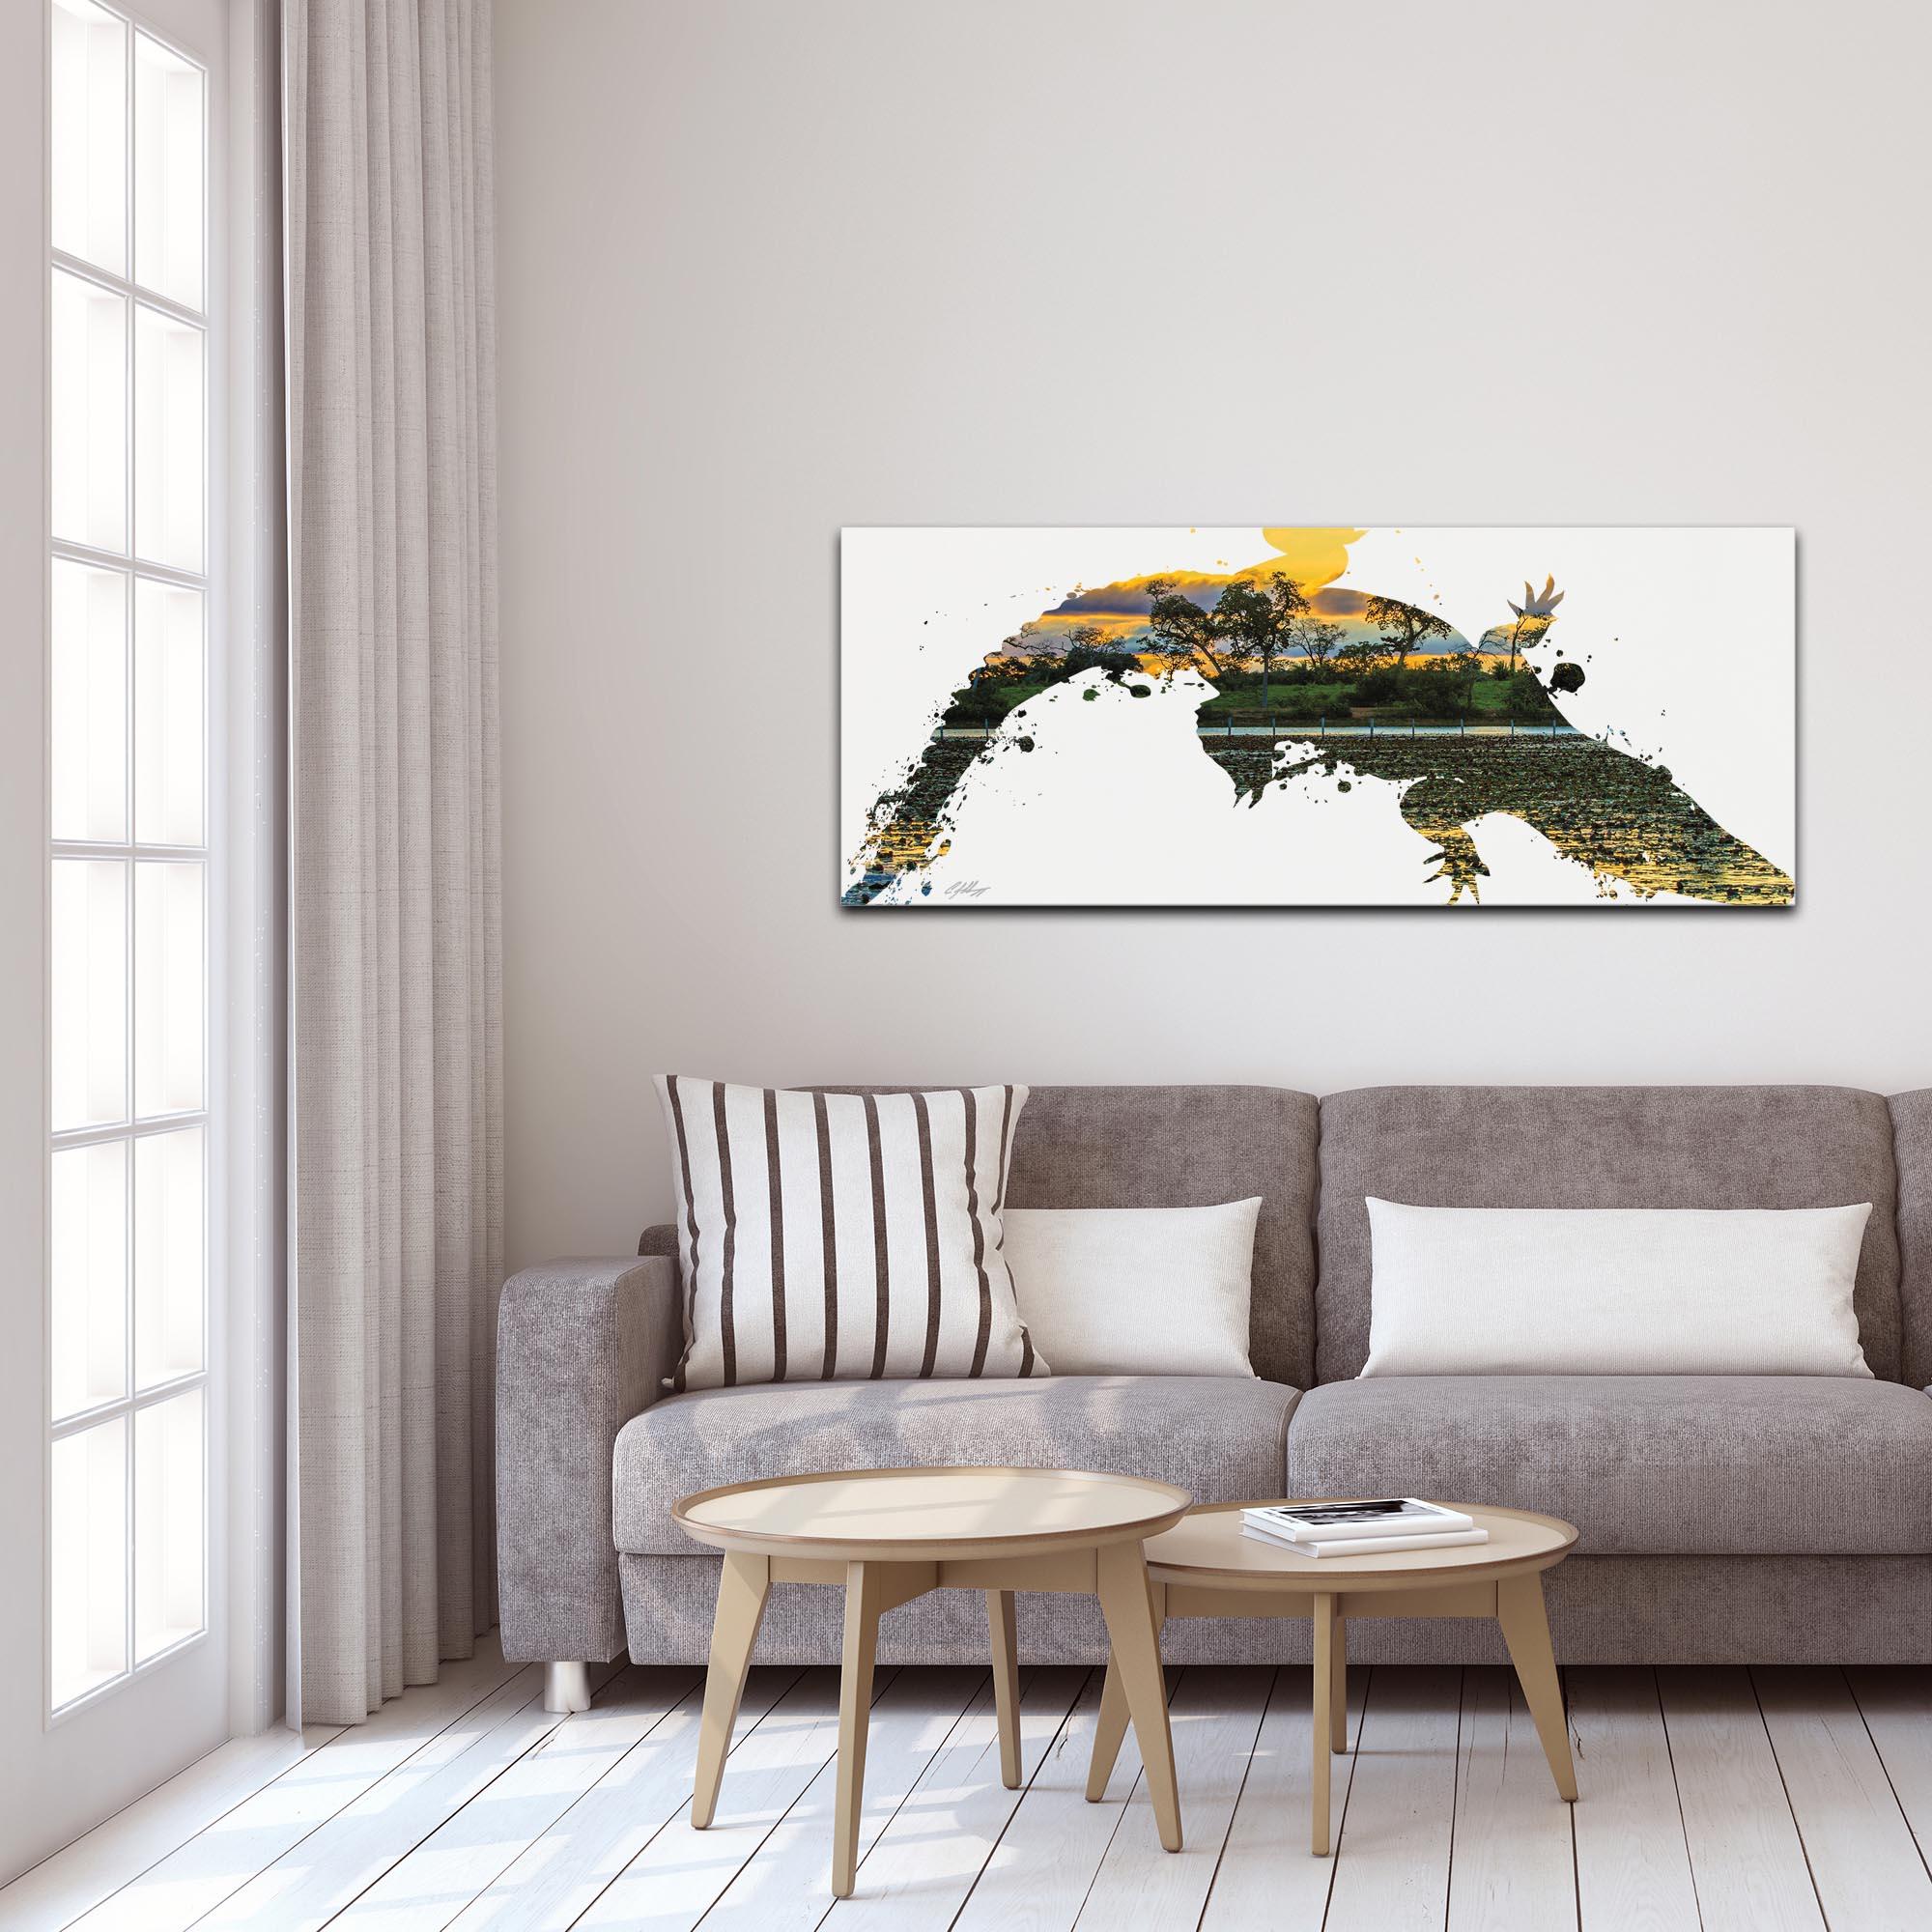 Alligator Swamp by Adam Schwoeppe Animal Silhouette on White Metal - Lifestyle View